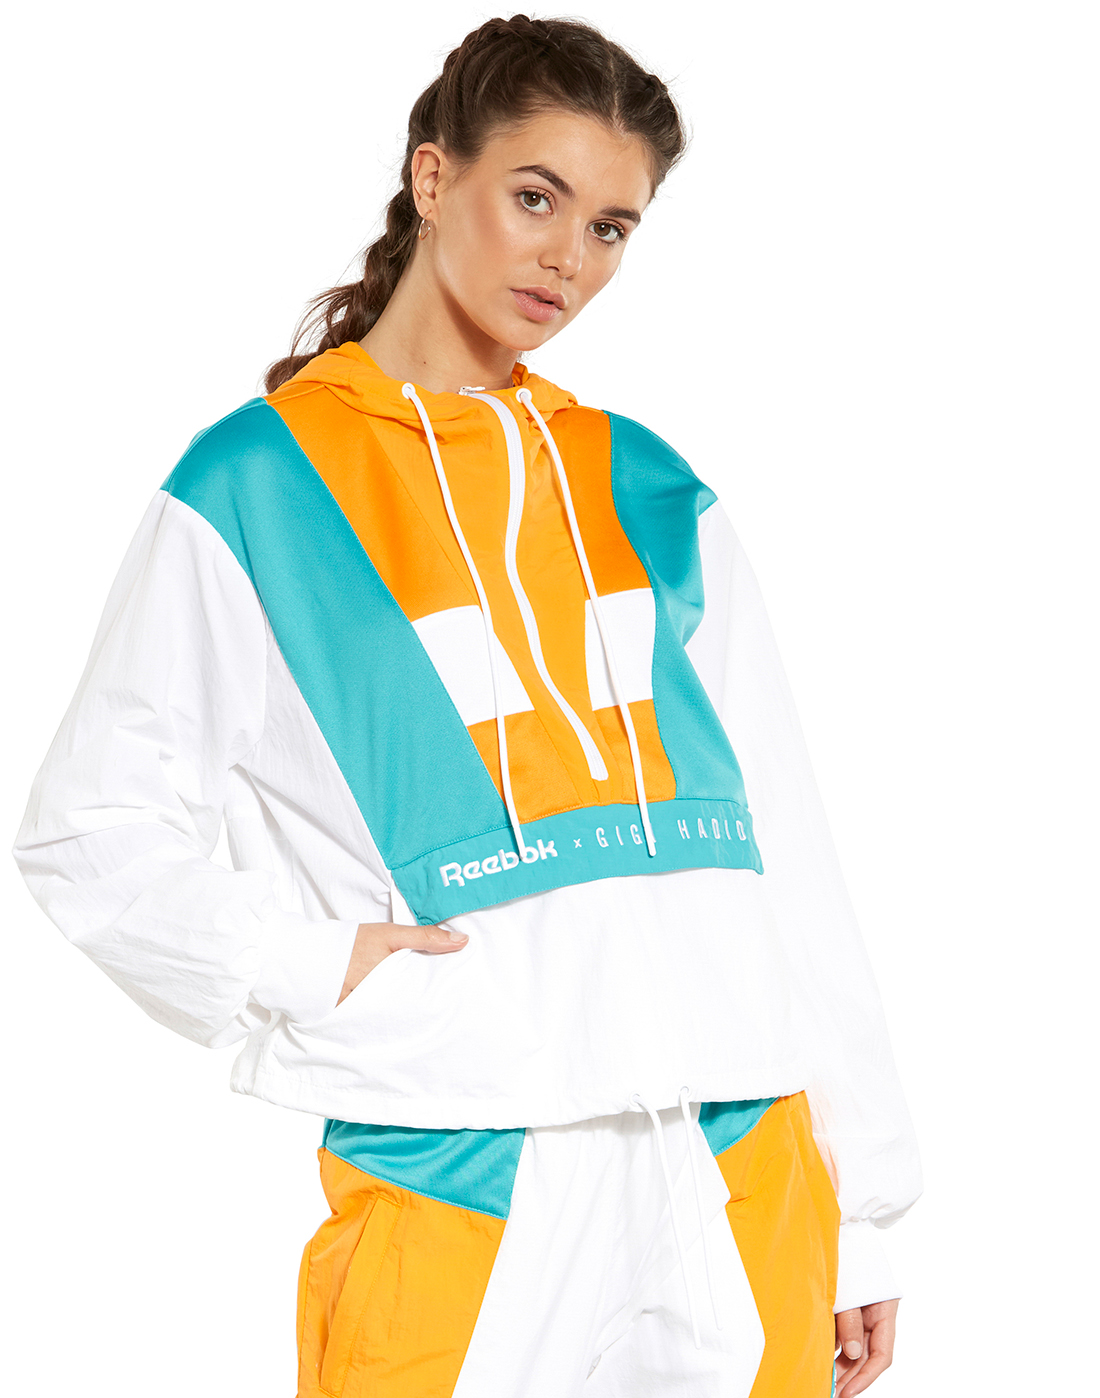 fa3b6ef9bea White   Yellow Gigi Hadid Reebok Cover up Jacket